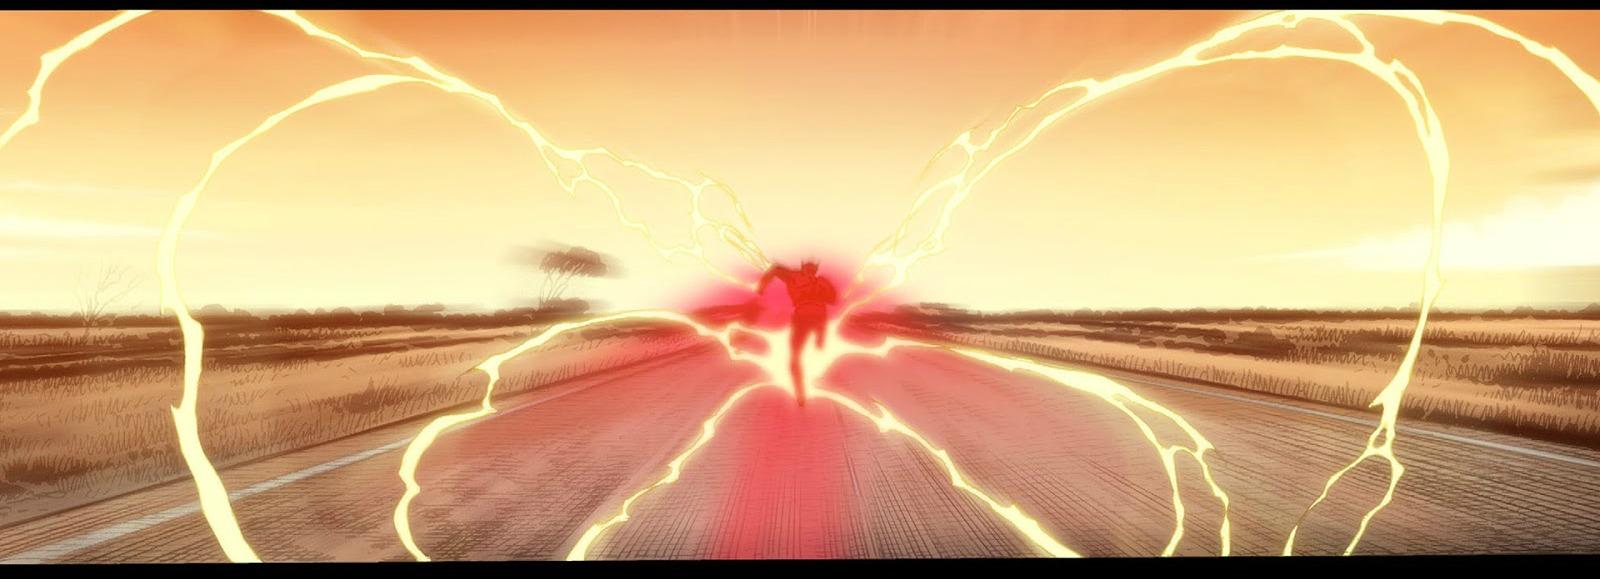 [4ML] Justice League Rebirth [JL] 642450correflash